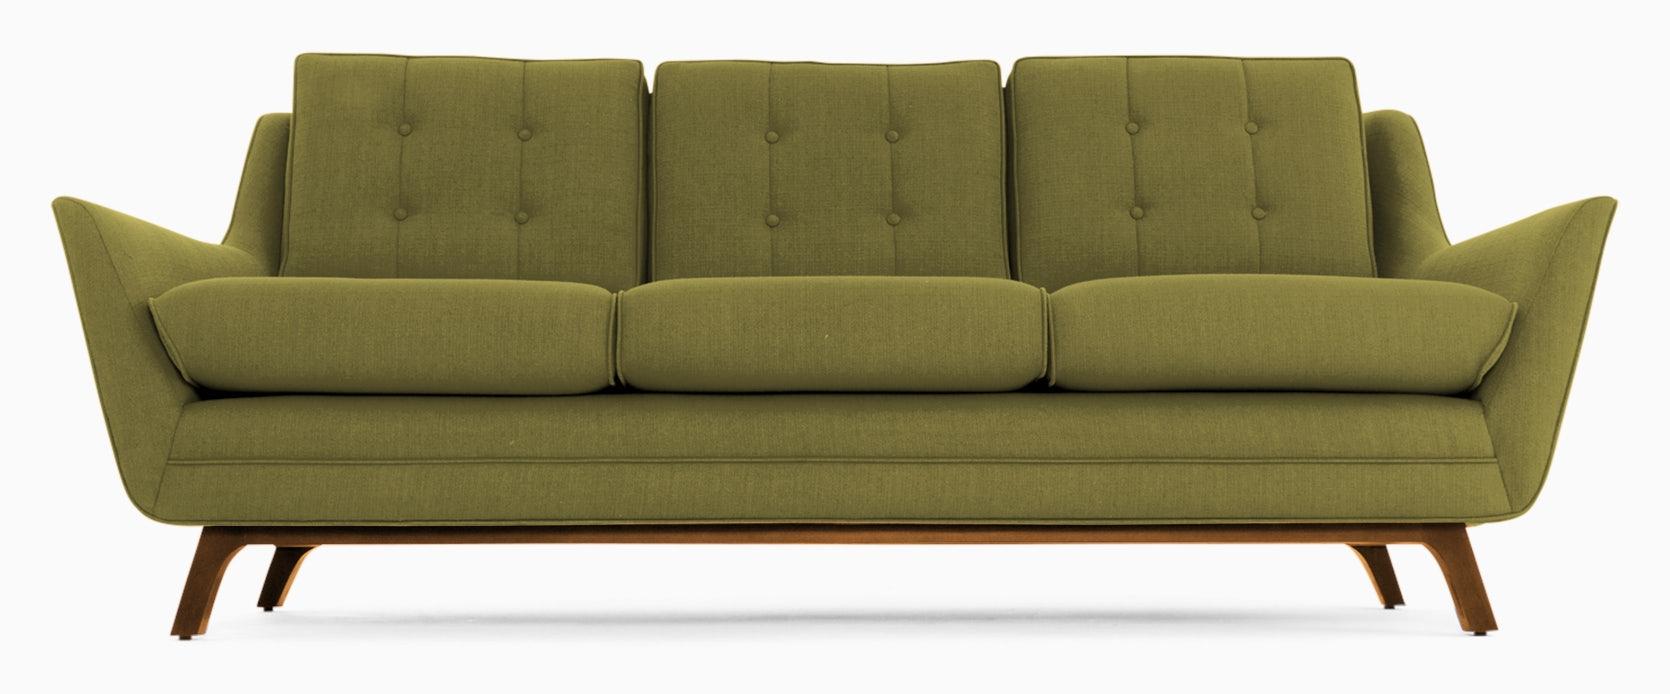 eastwood sofa key largo grass